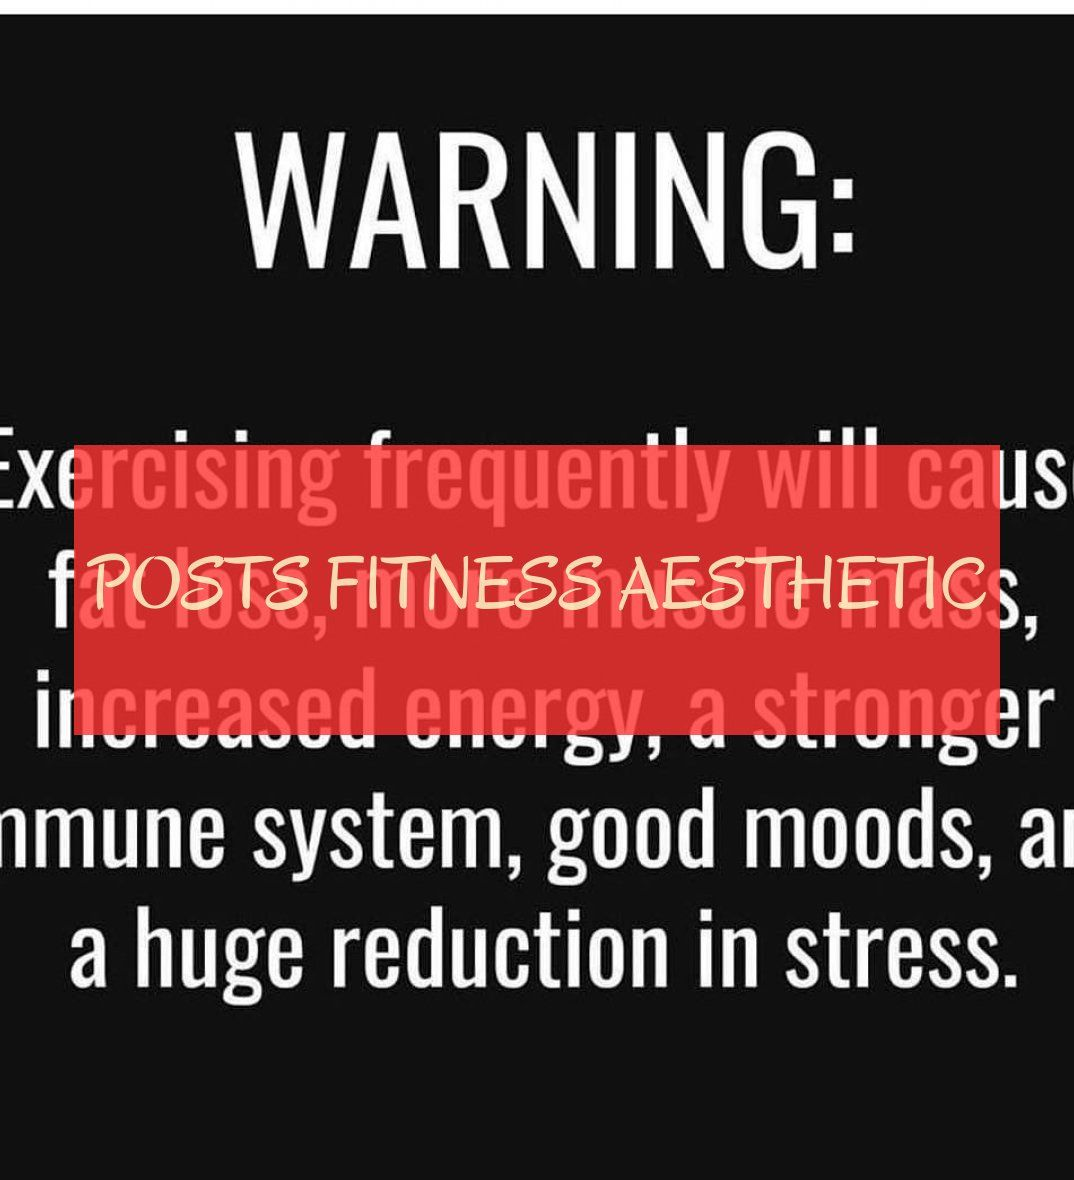 Posts Fitness aesthetic #Posts #Fitness #aesthetic